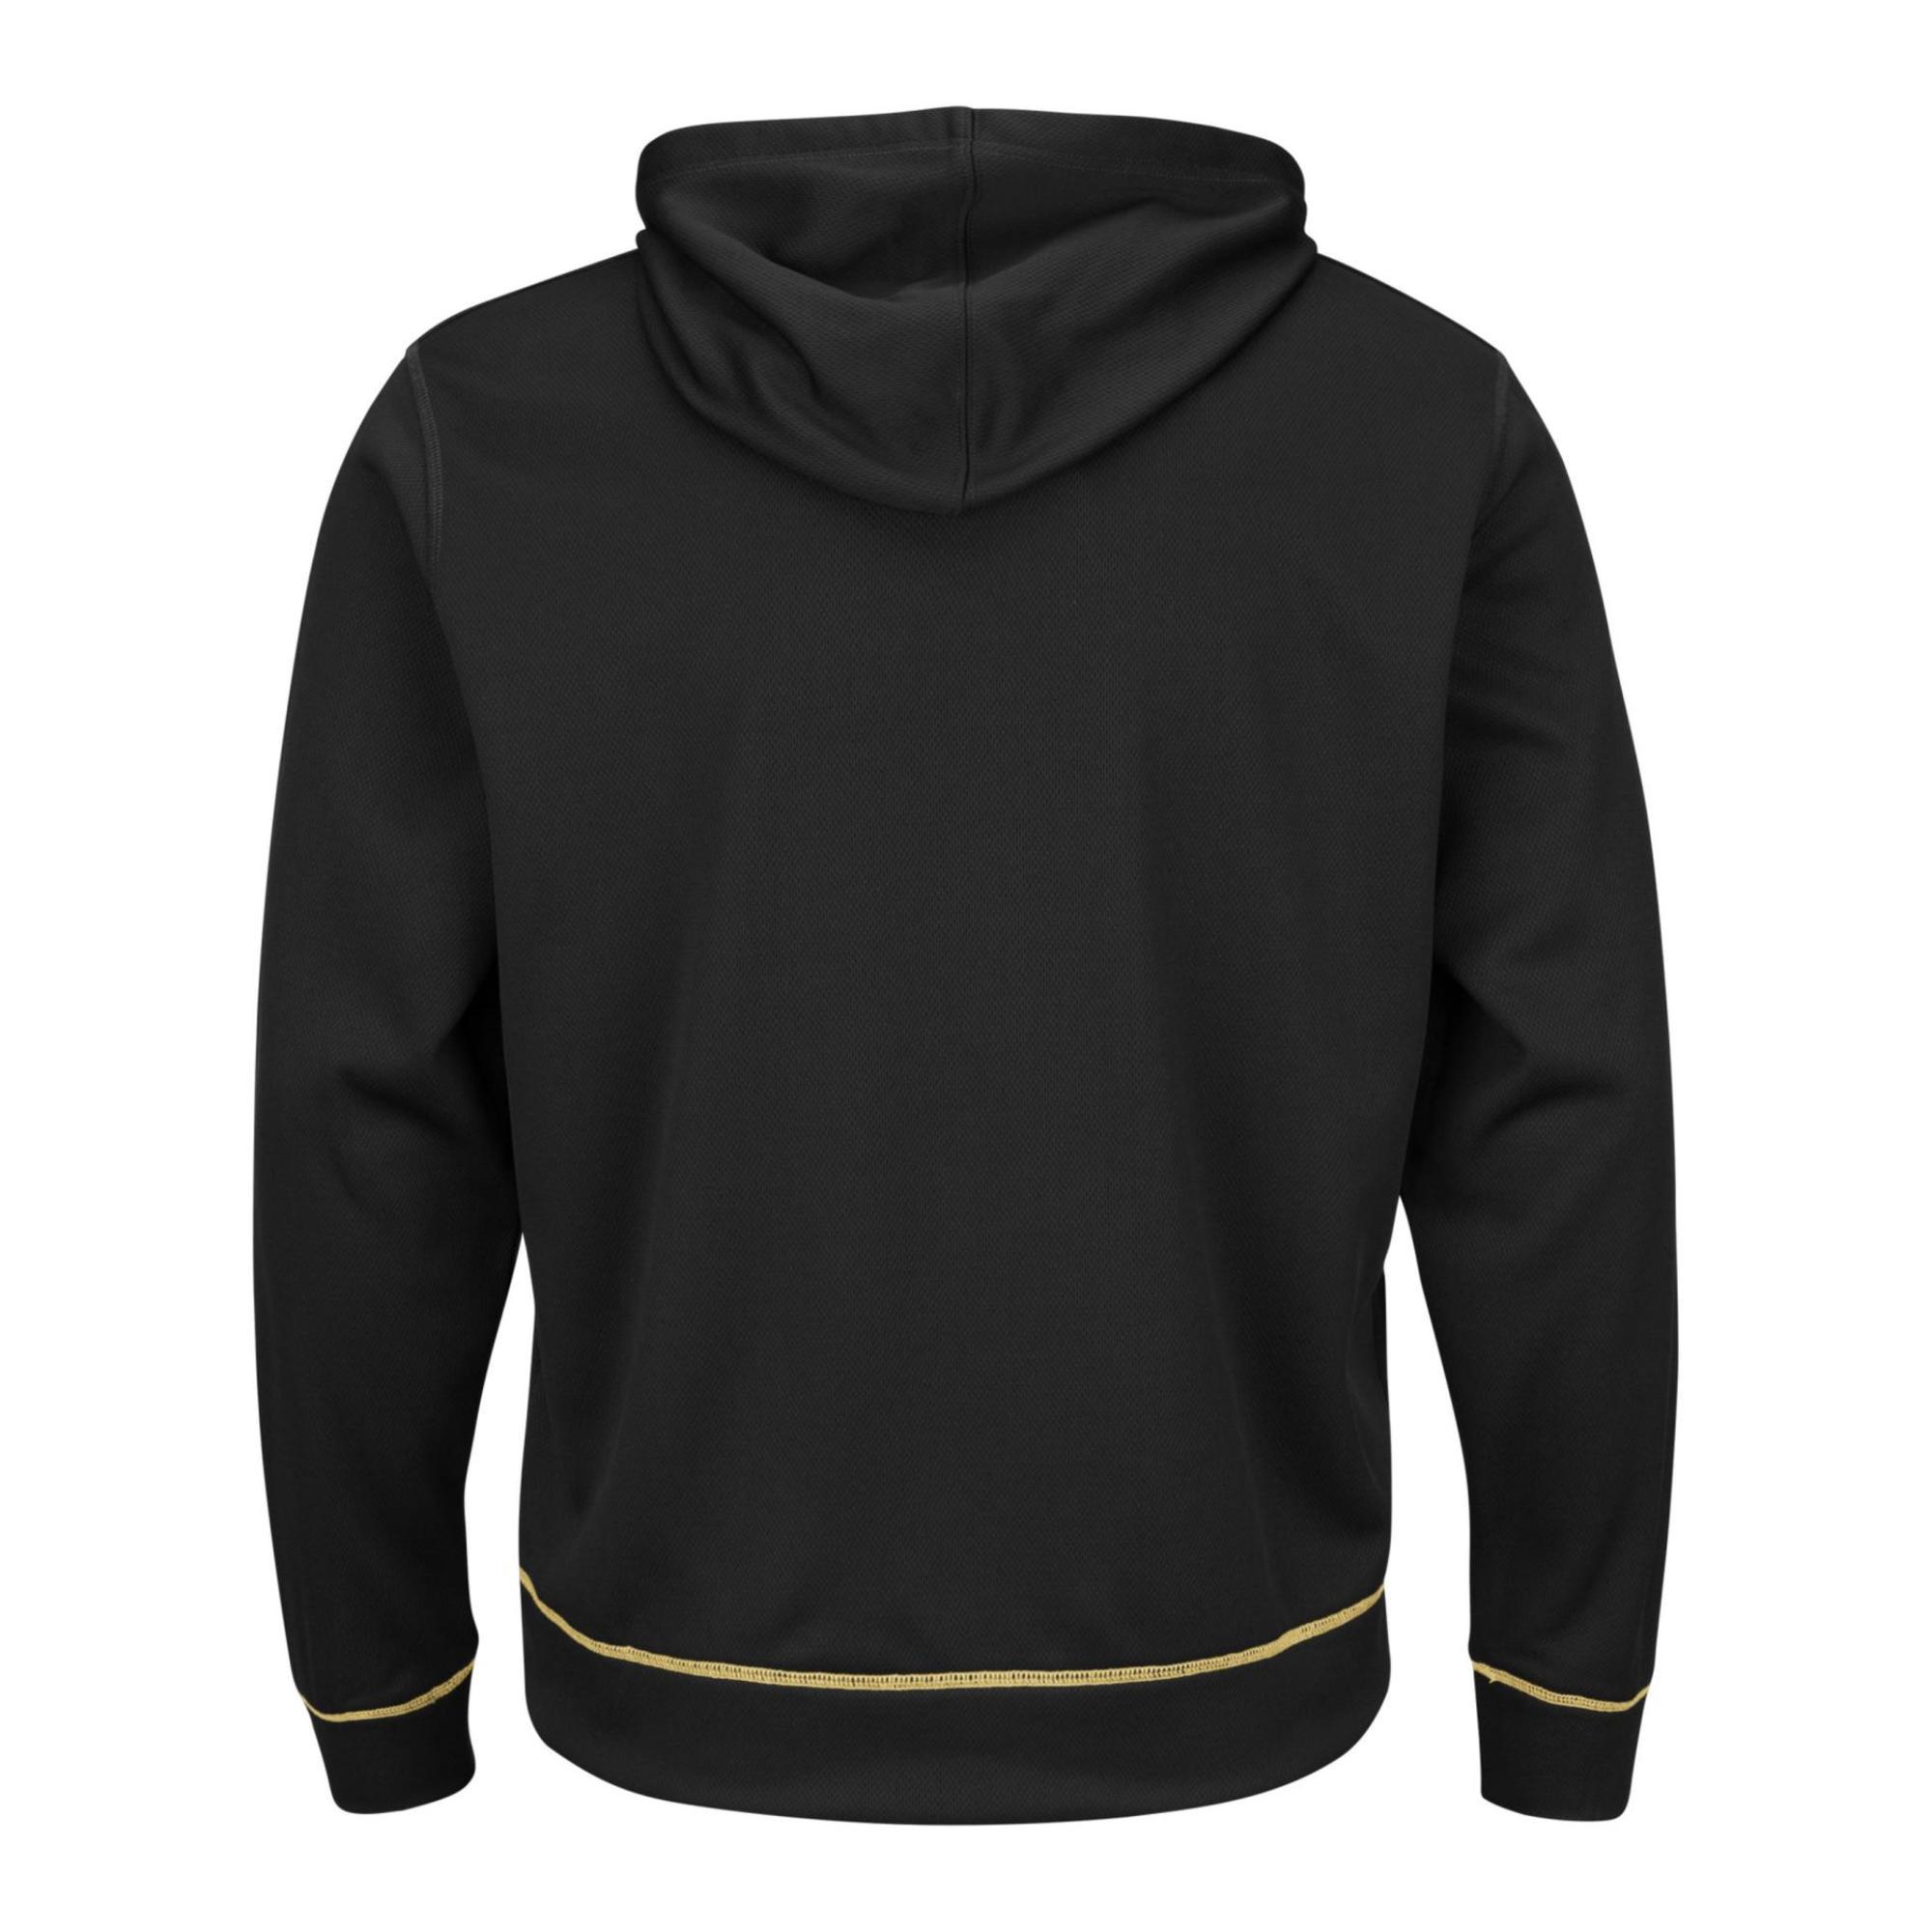 NFL Men's Hooded Sweatshirt - New Orleans Saints